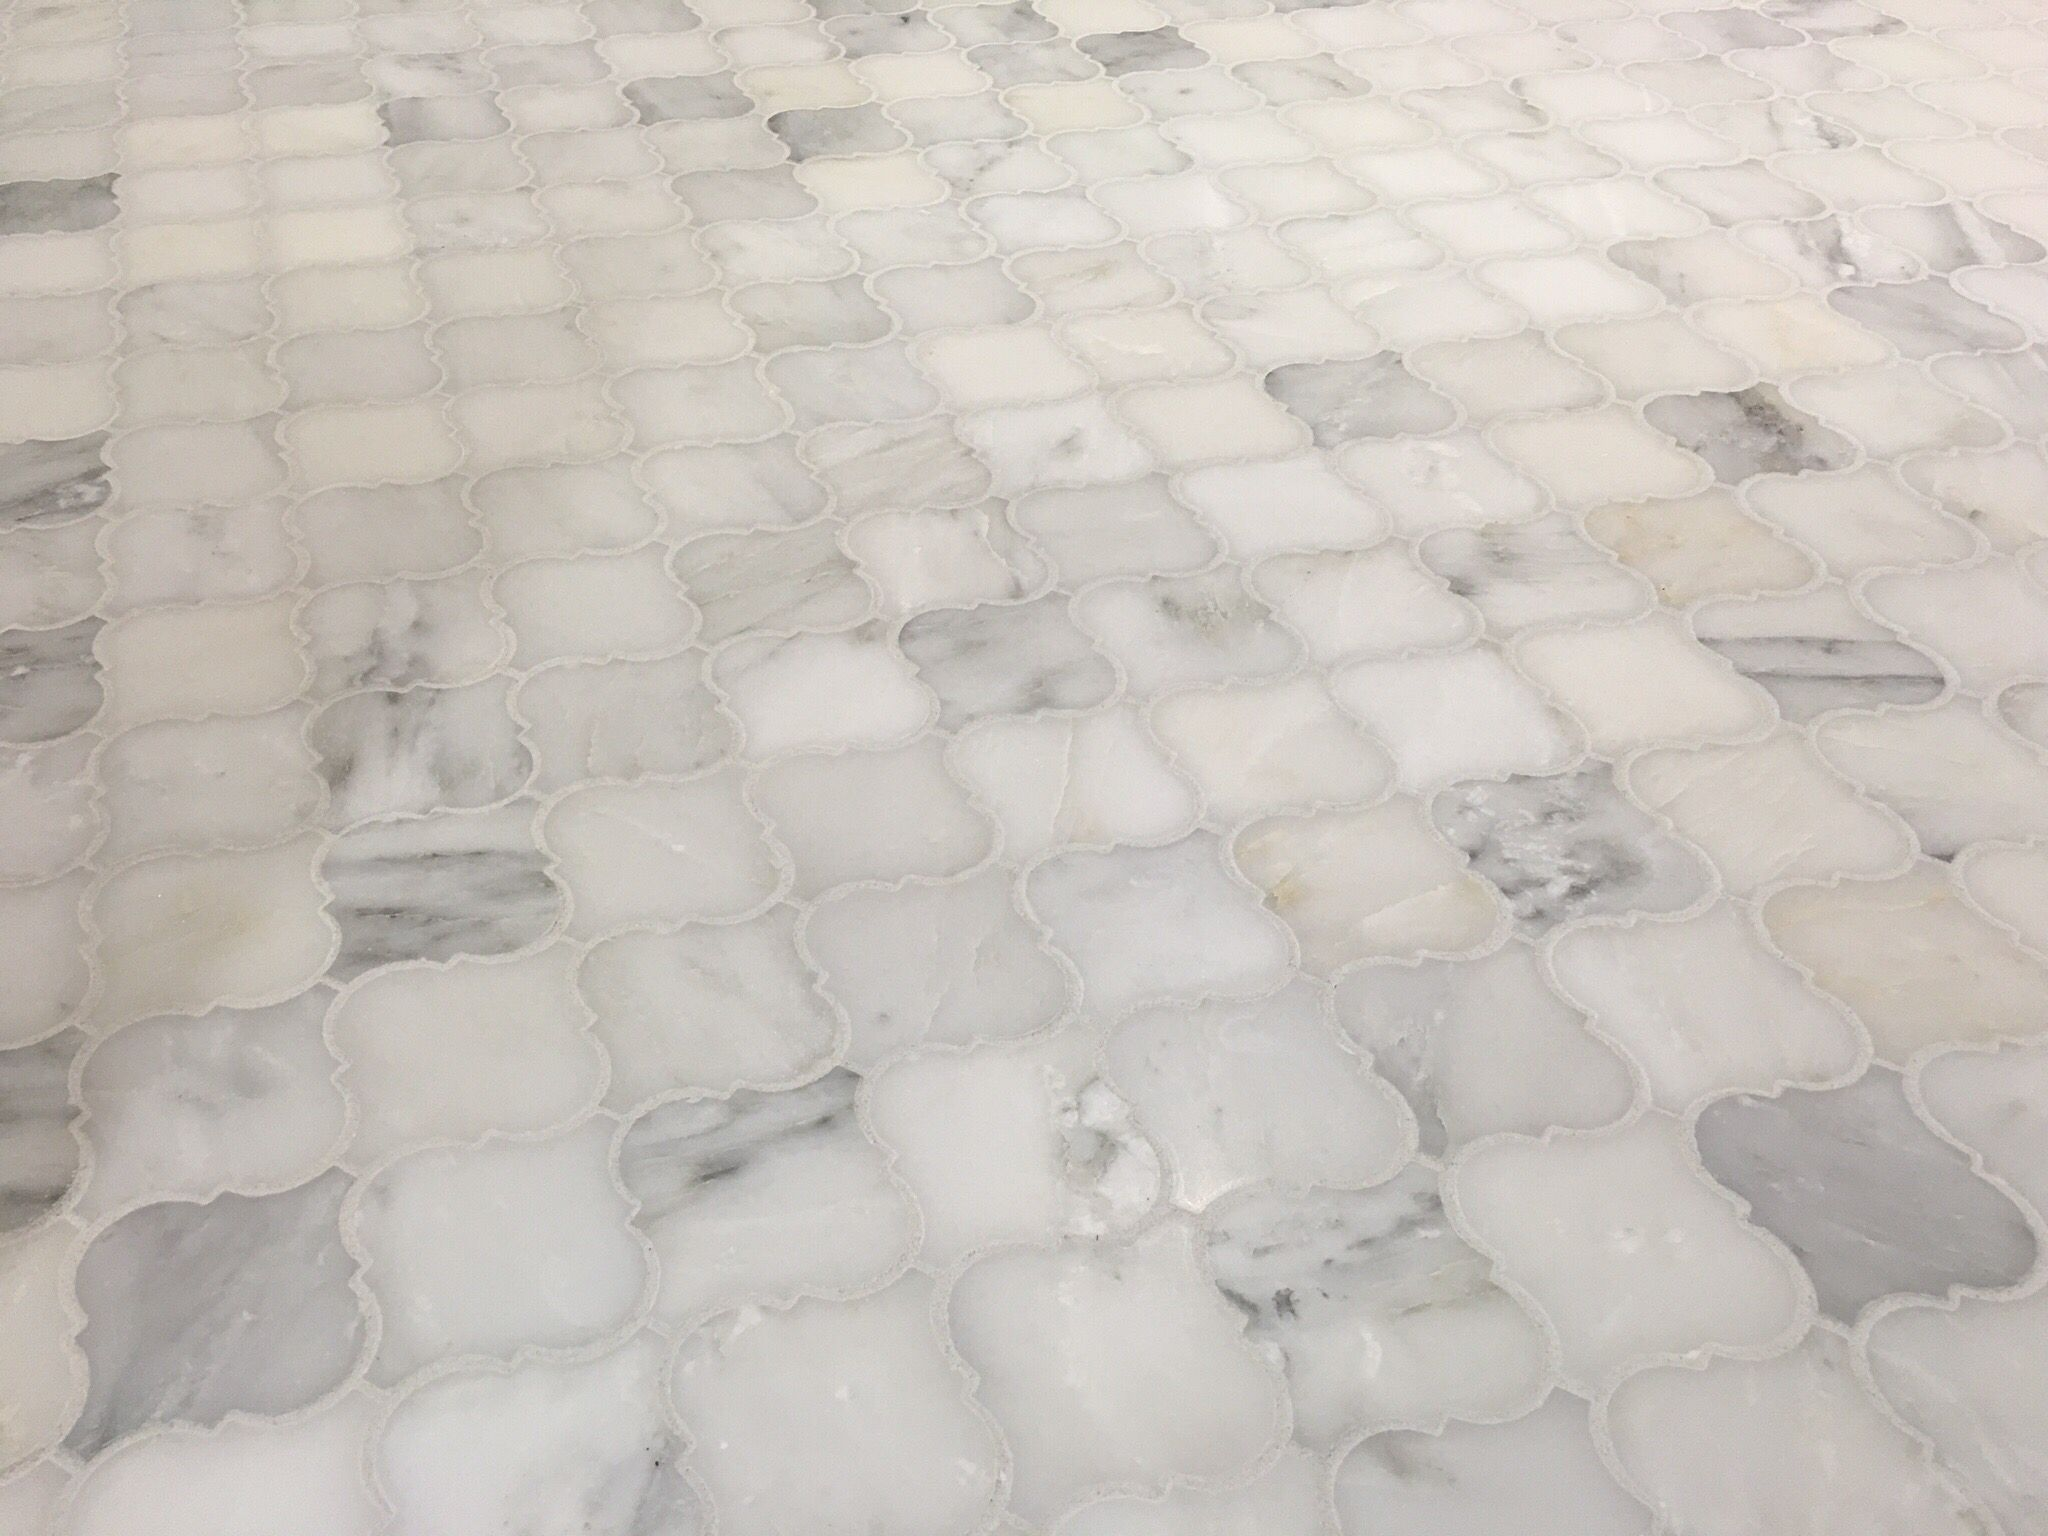 Carrera marble arabesque mosaic tile bathroom floor marble carrera marble arabesque mosaic tile bathroom floor dailygadgetfo Gallery